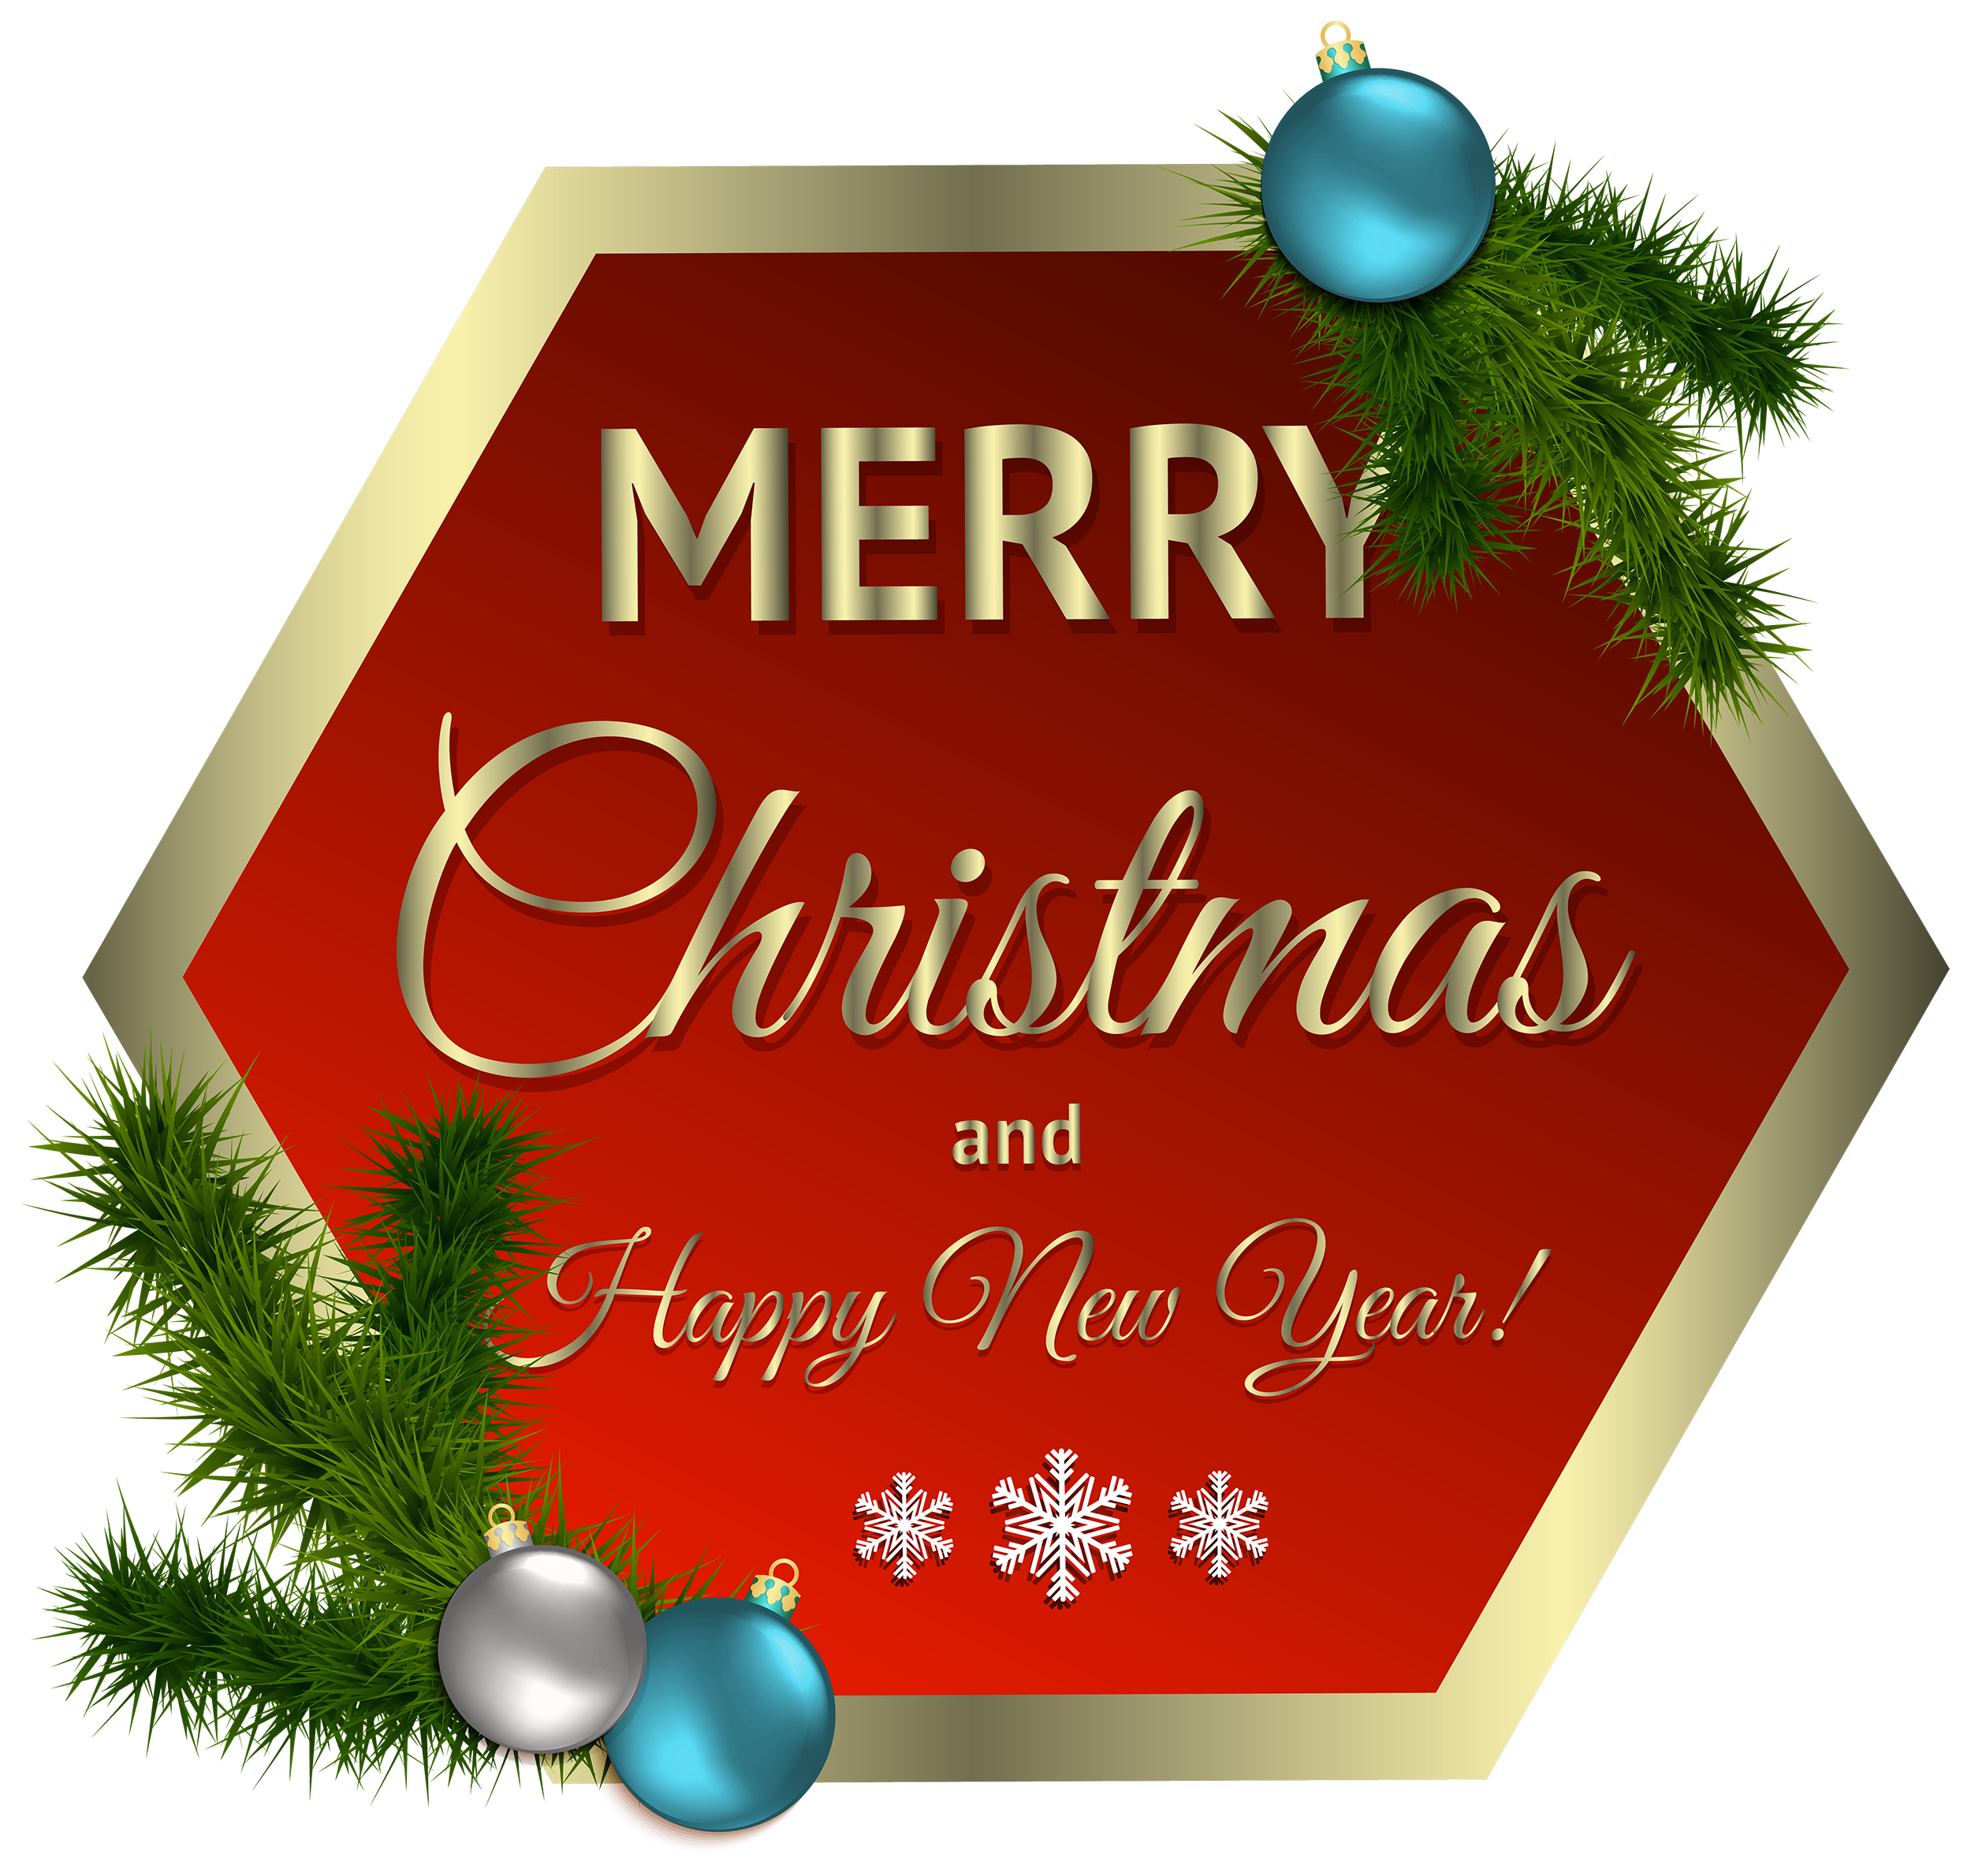 Christmas sayings clipart jpg royalty free download Pin by Antonia Mendez on ETIQUETAS DE NAVIDAD | Pinterest jpg royalty free download